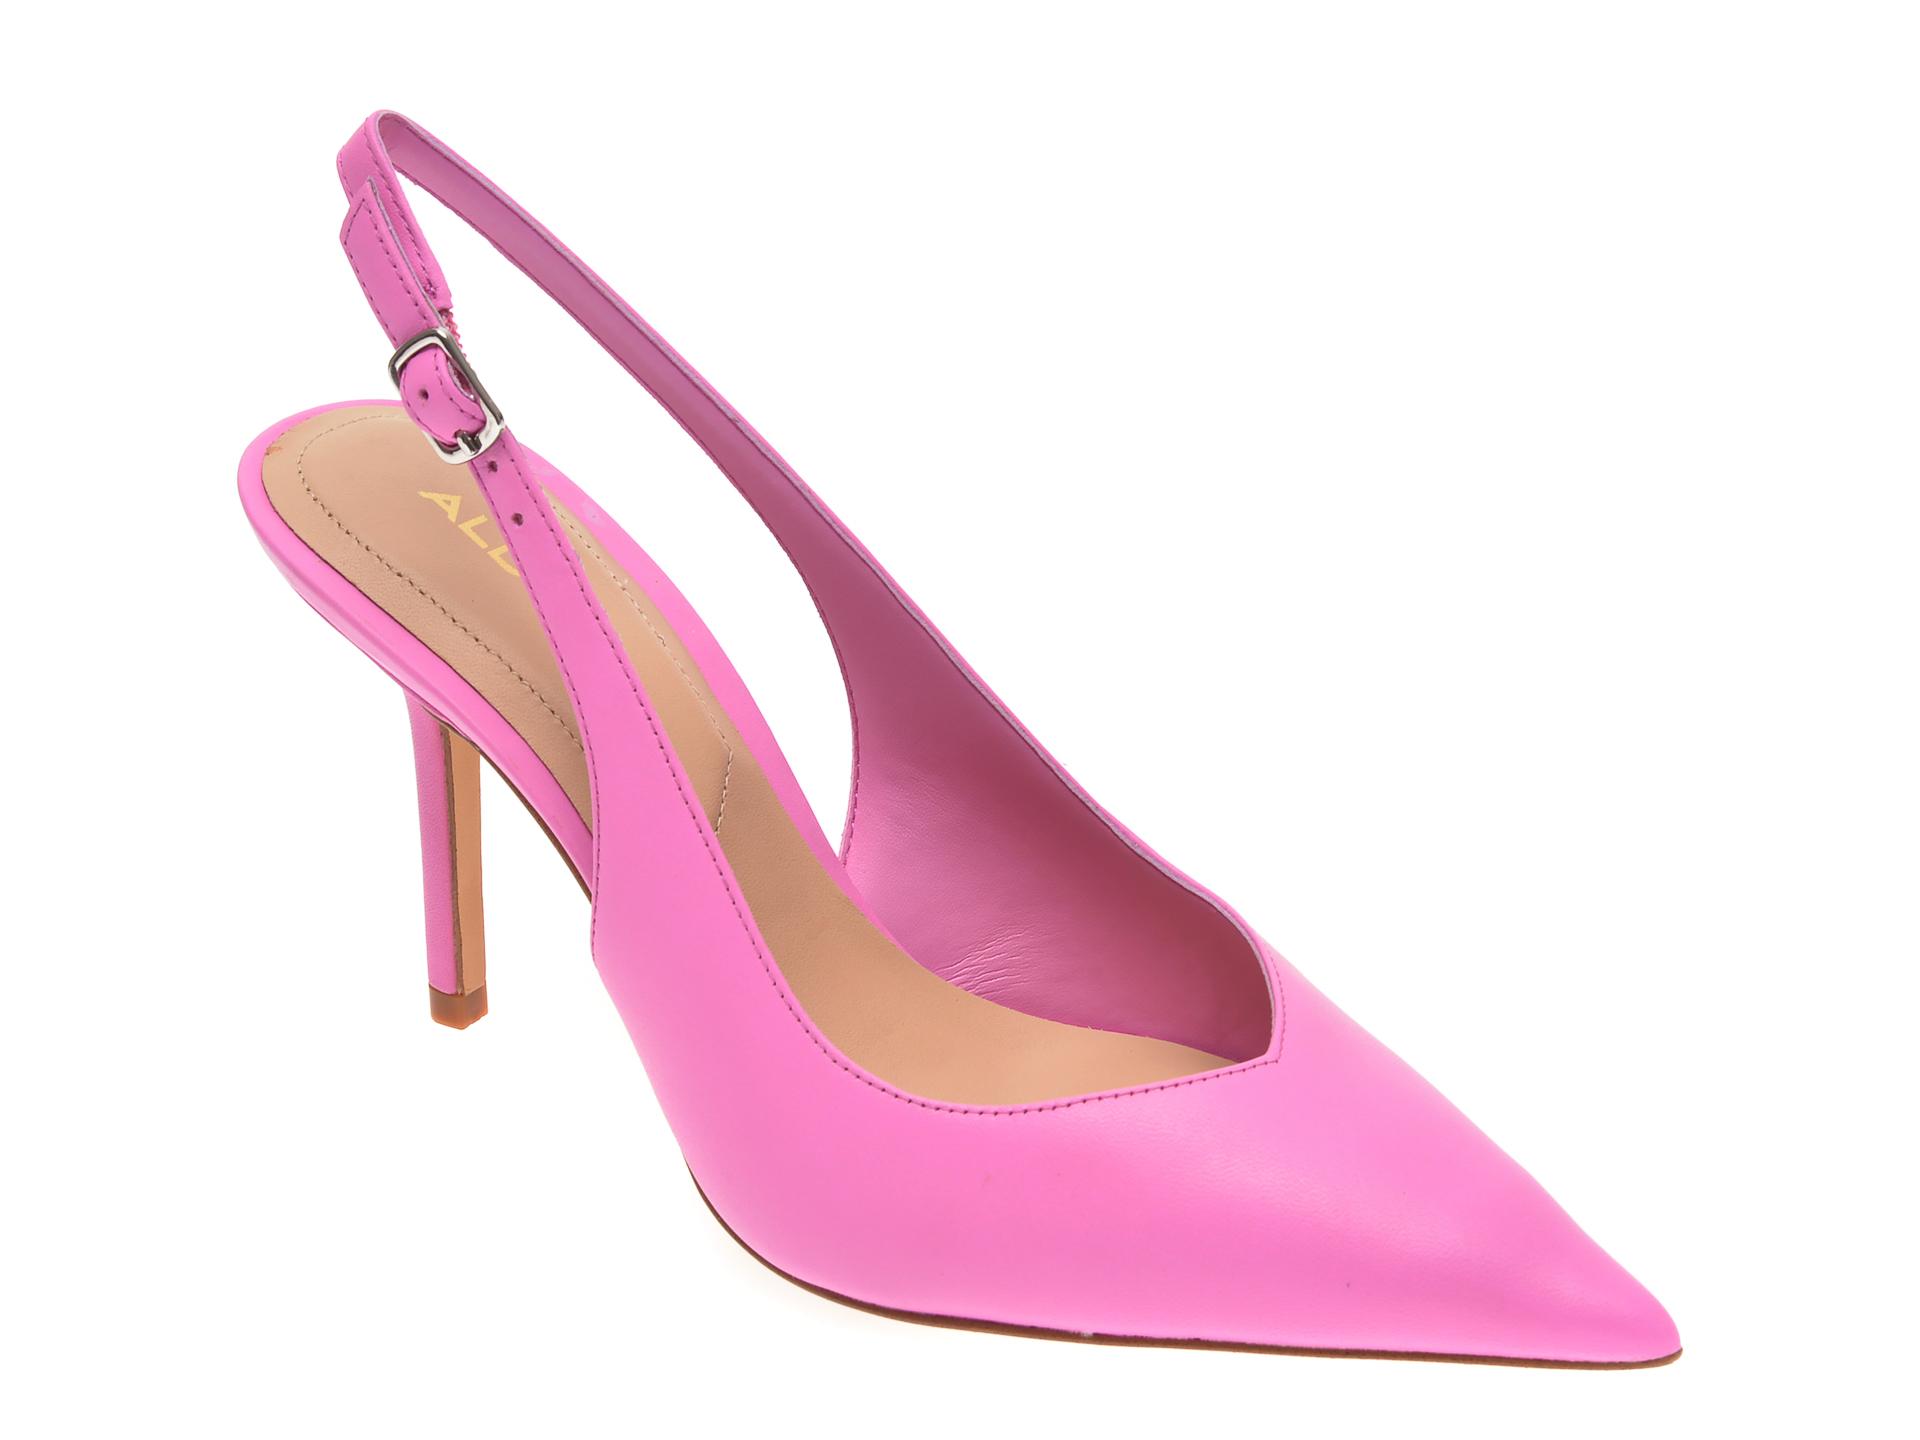 Pantofi ALDO roz, Julietta680, din piele naturala imagine otter.ro 2021